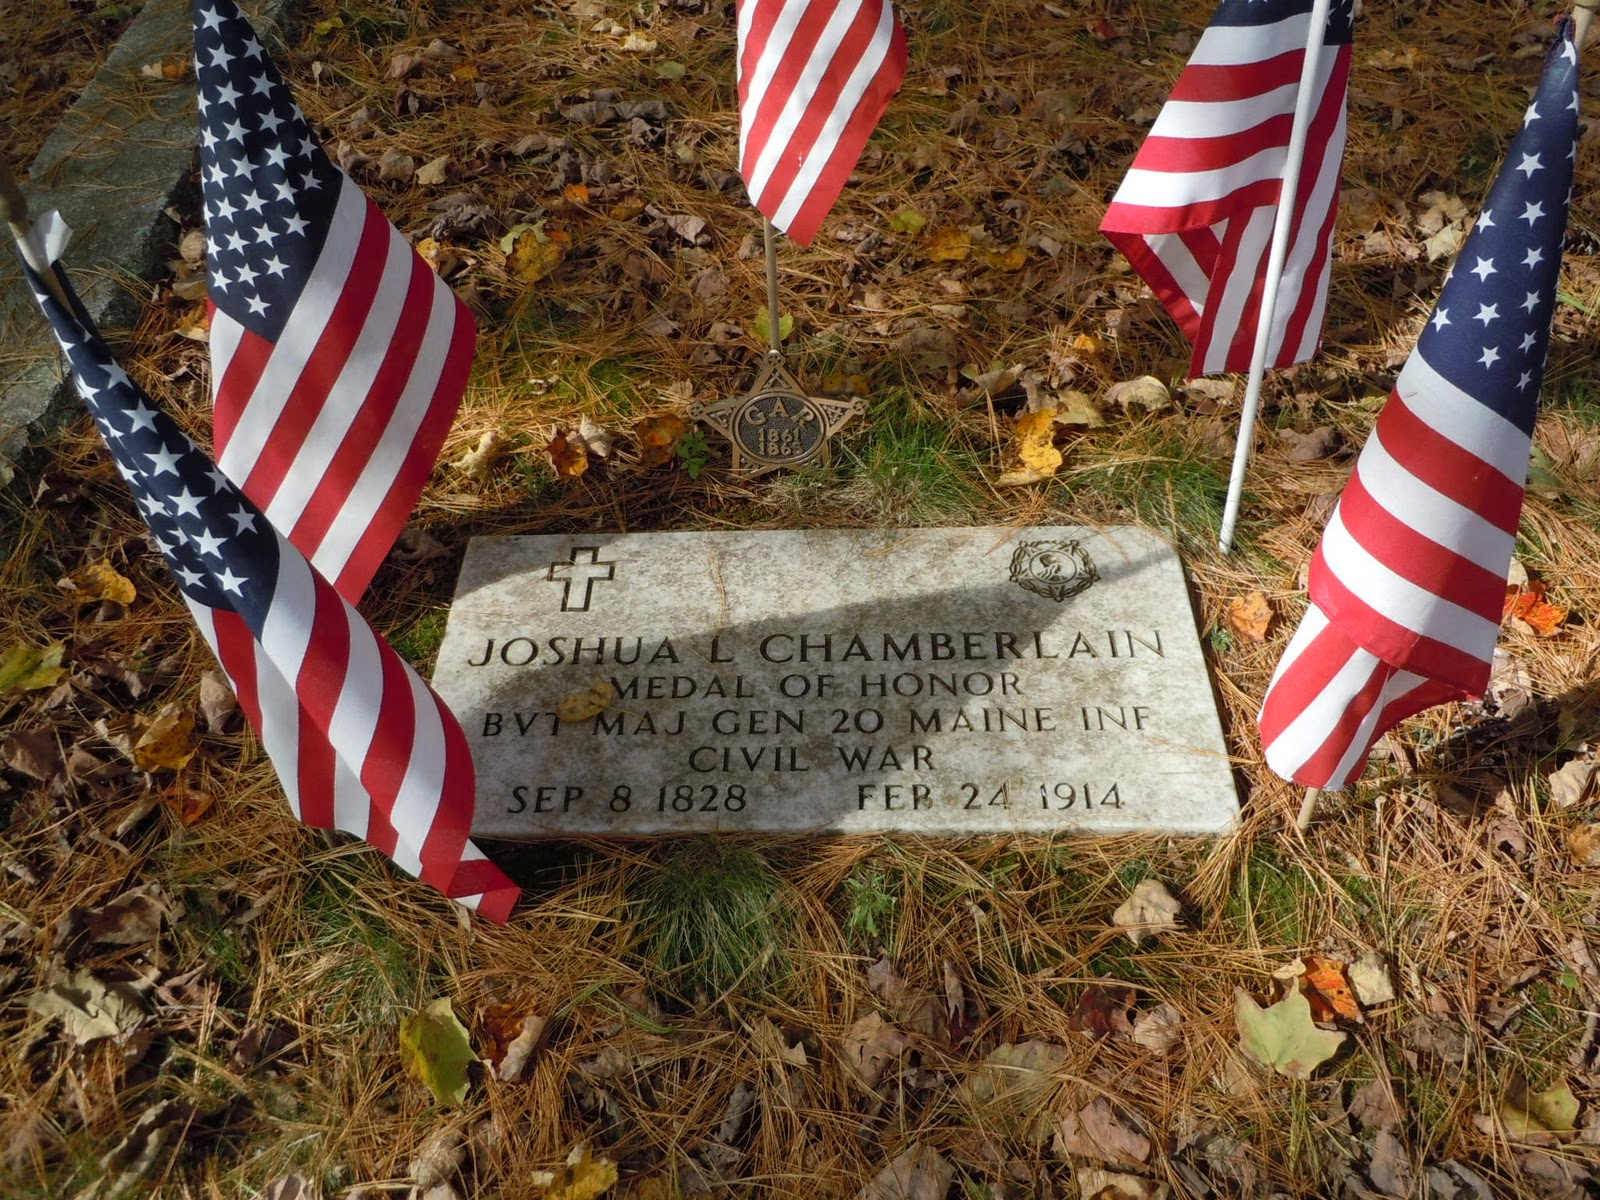 joshua l chamberlain Joshua lawrence chamberlain (born lawrence joshua chamberlain , september 8, 1828 – february 24, 1914) was an american college professor from.